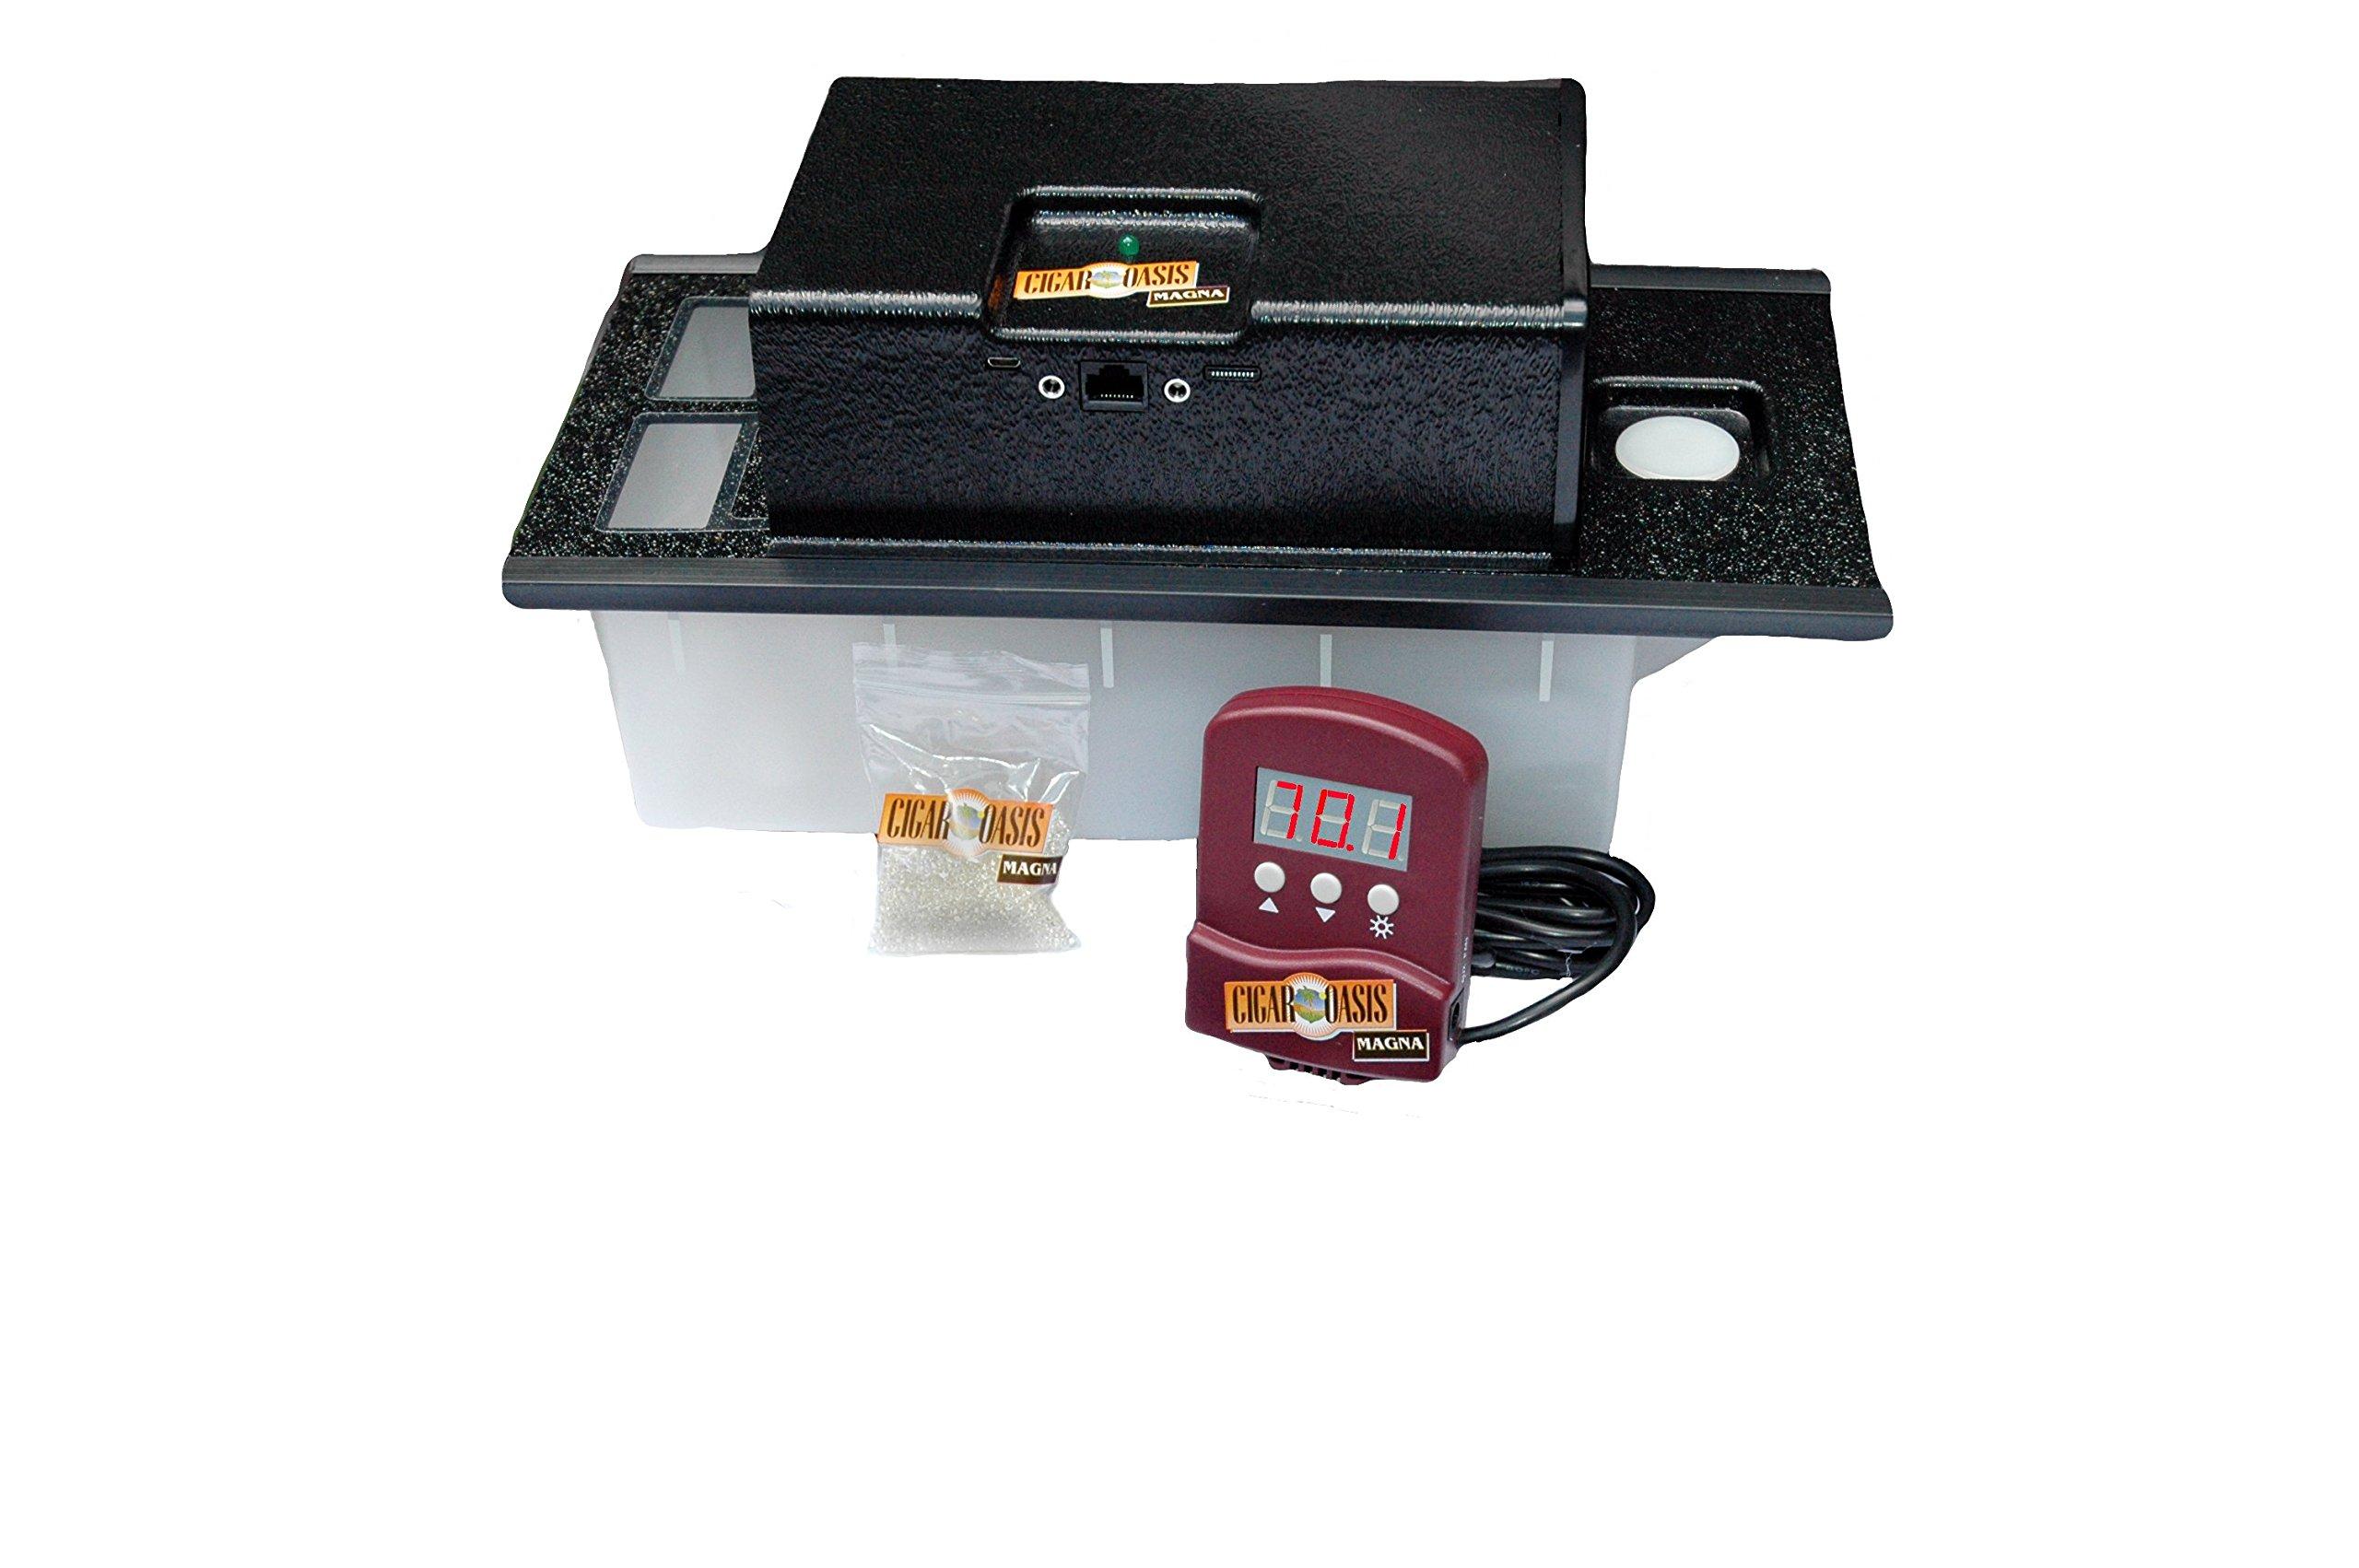 Cigar Oasis Magna 3.0 Electronic Humidifier